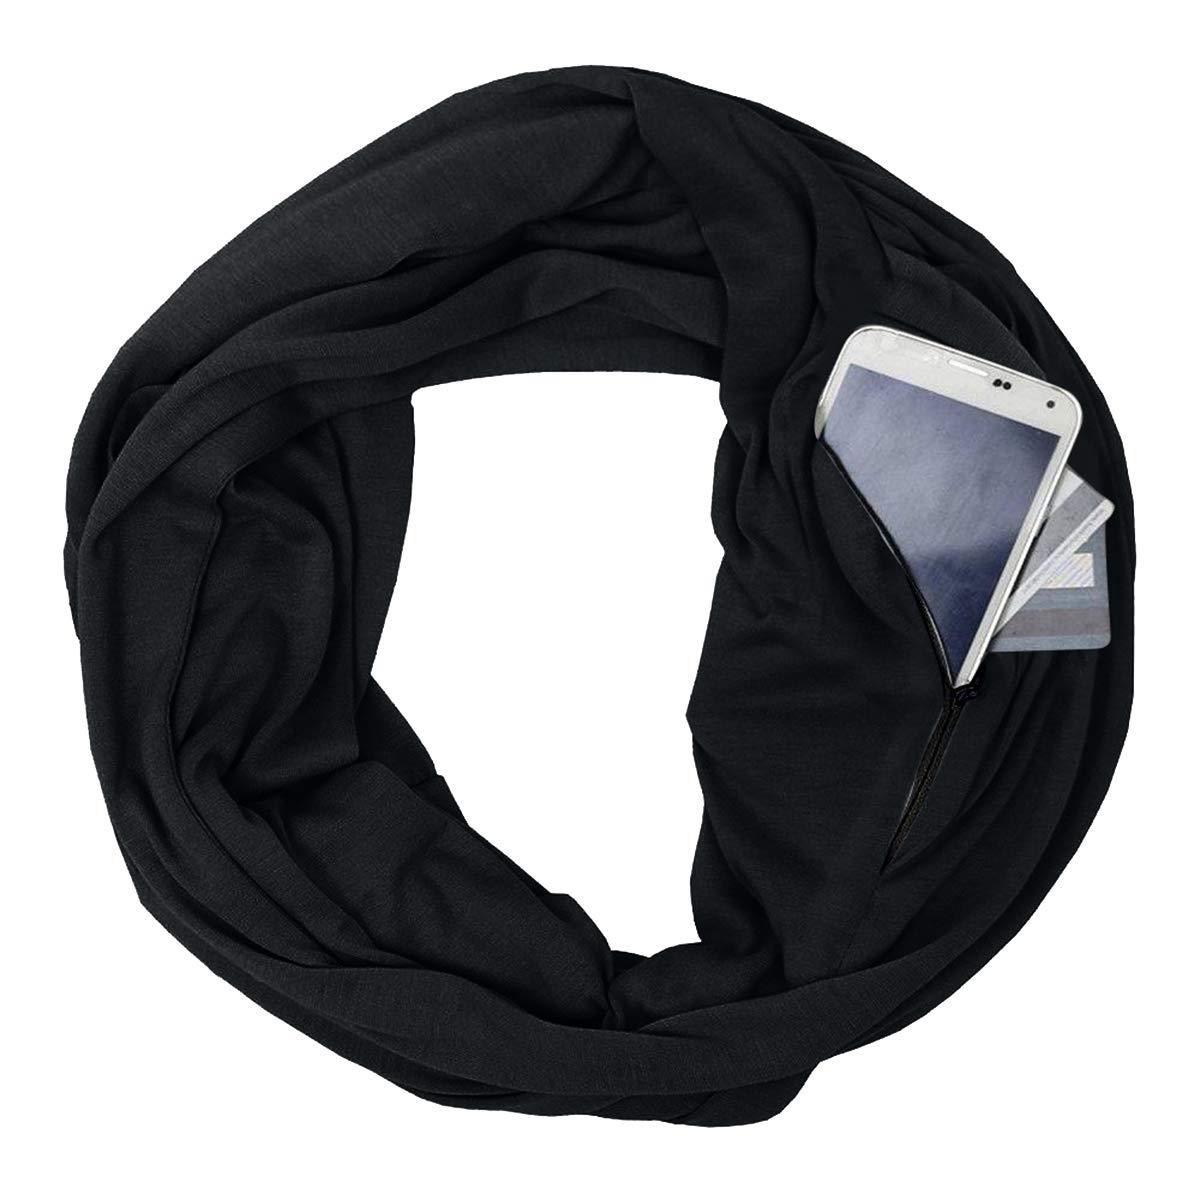 Blacka Fashion Scarves for Women, Girls, Ladies, Infinity Scarf with Zipper Pocket Pattern Print Lightweight Wrap